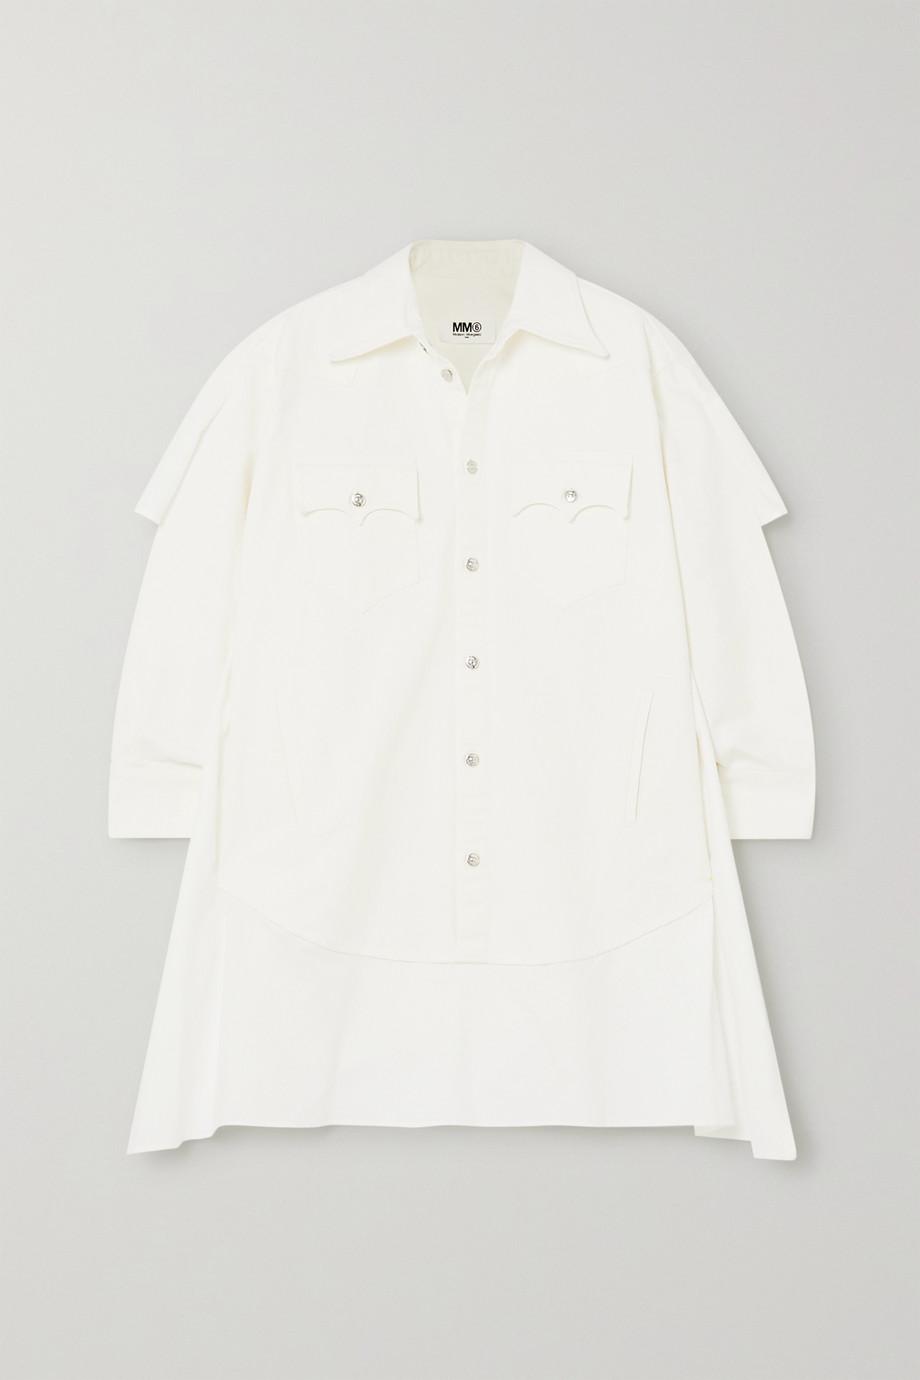 MM6 Maison Margiela Paneled denim and cotton-poplin shirt dress